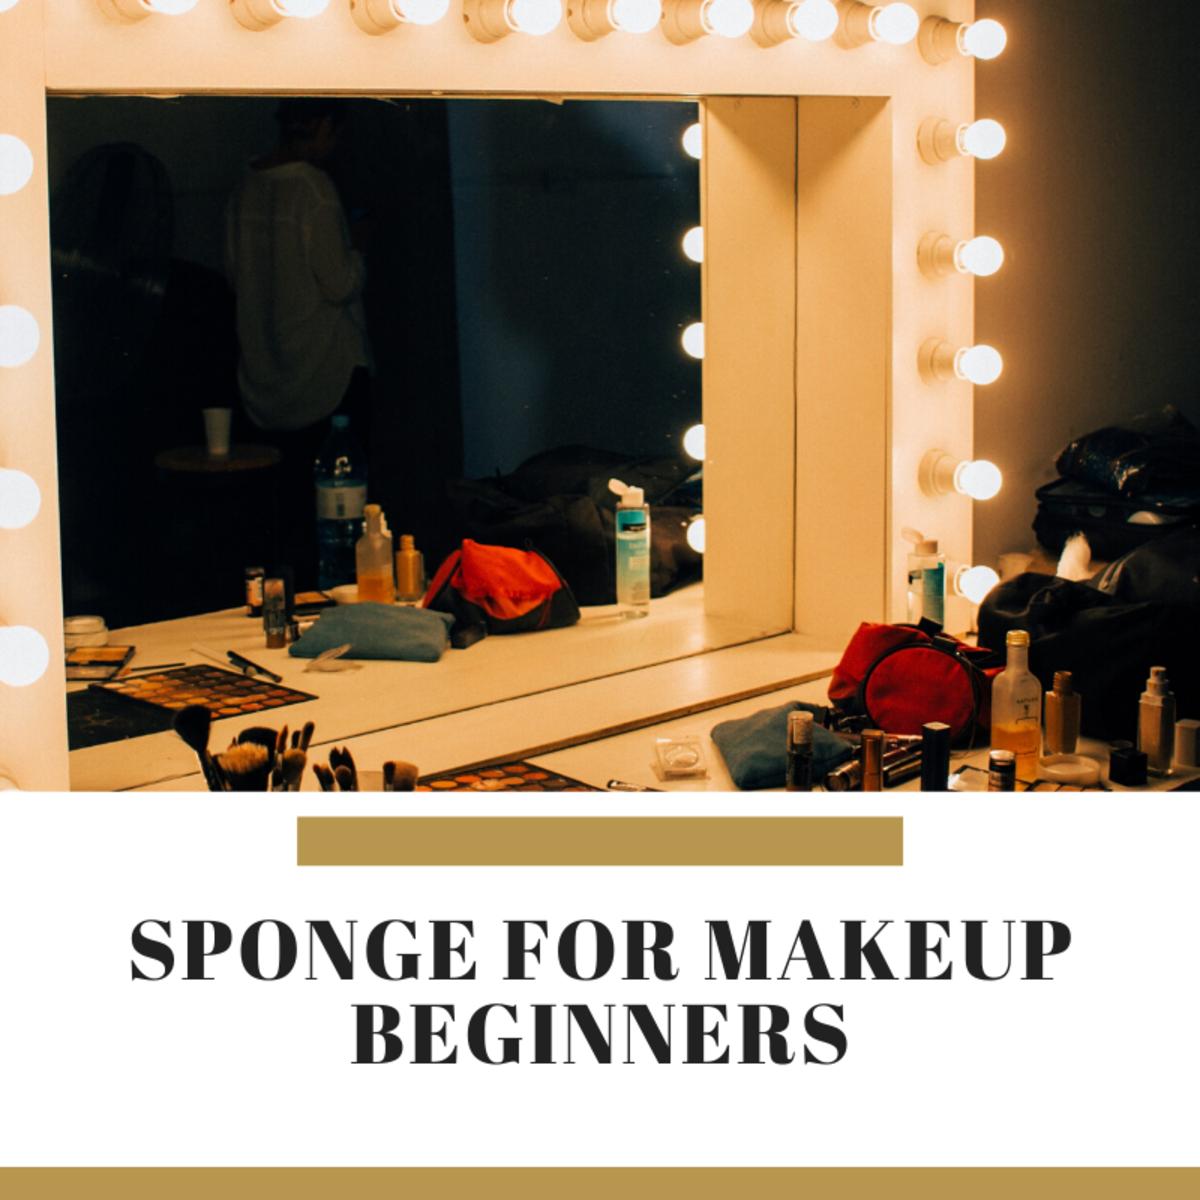 Choosing a Beauty Blender Sponge for Makeup Beginners